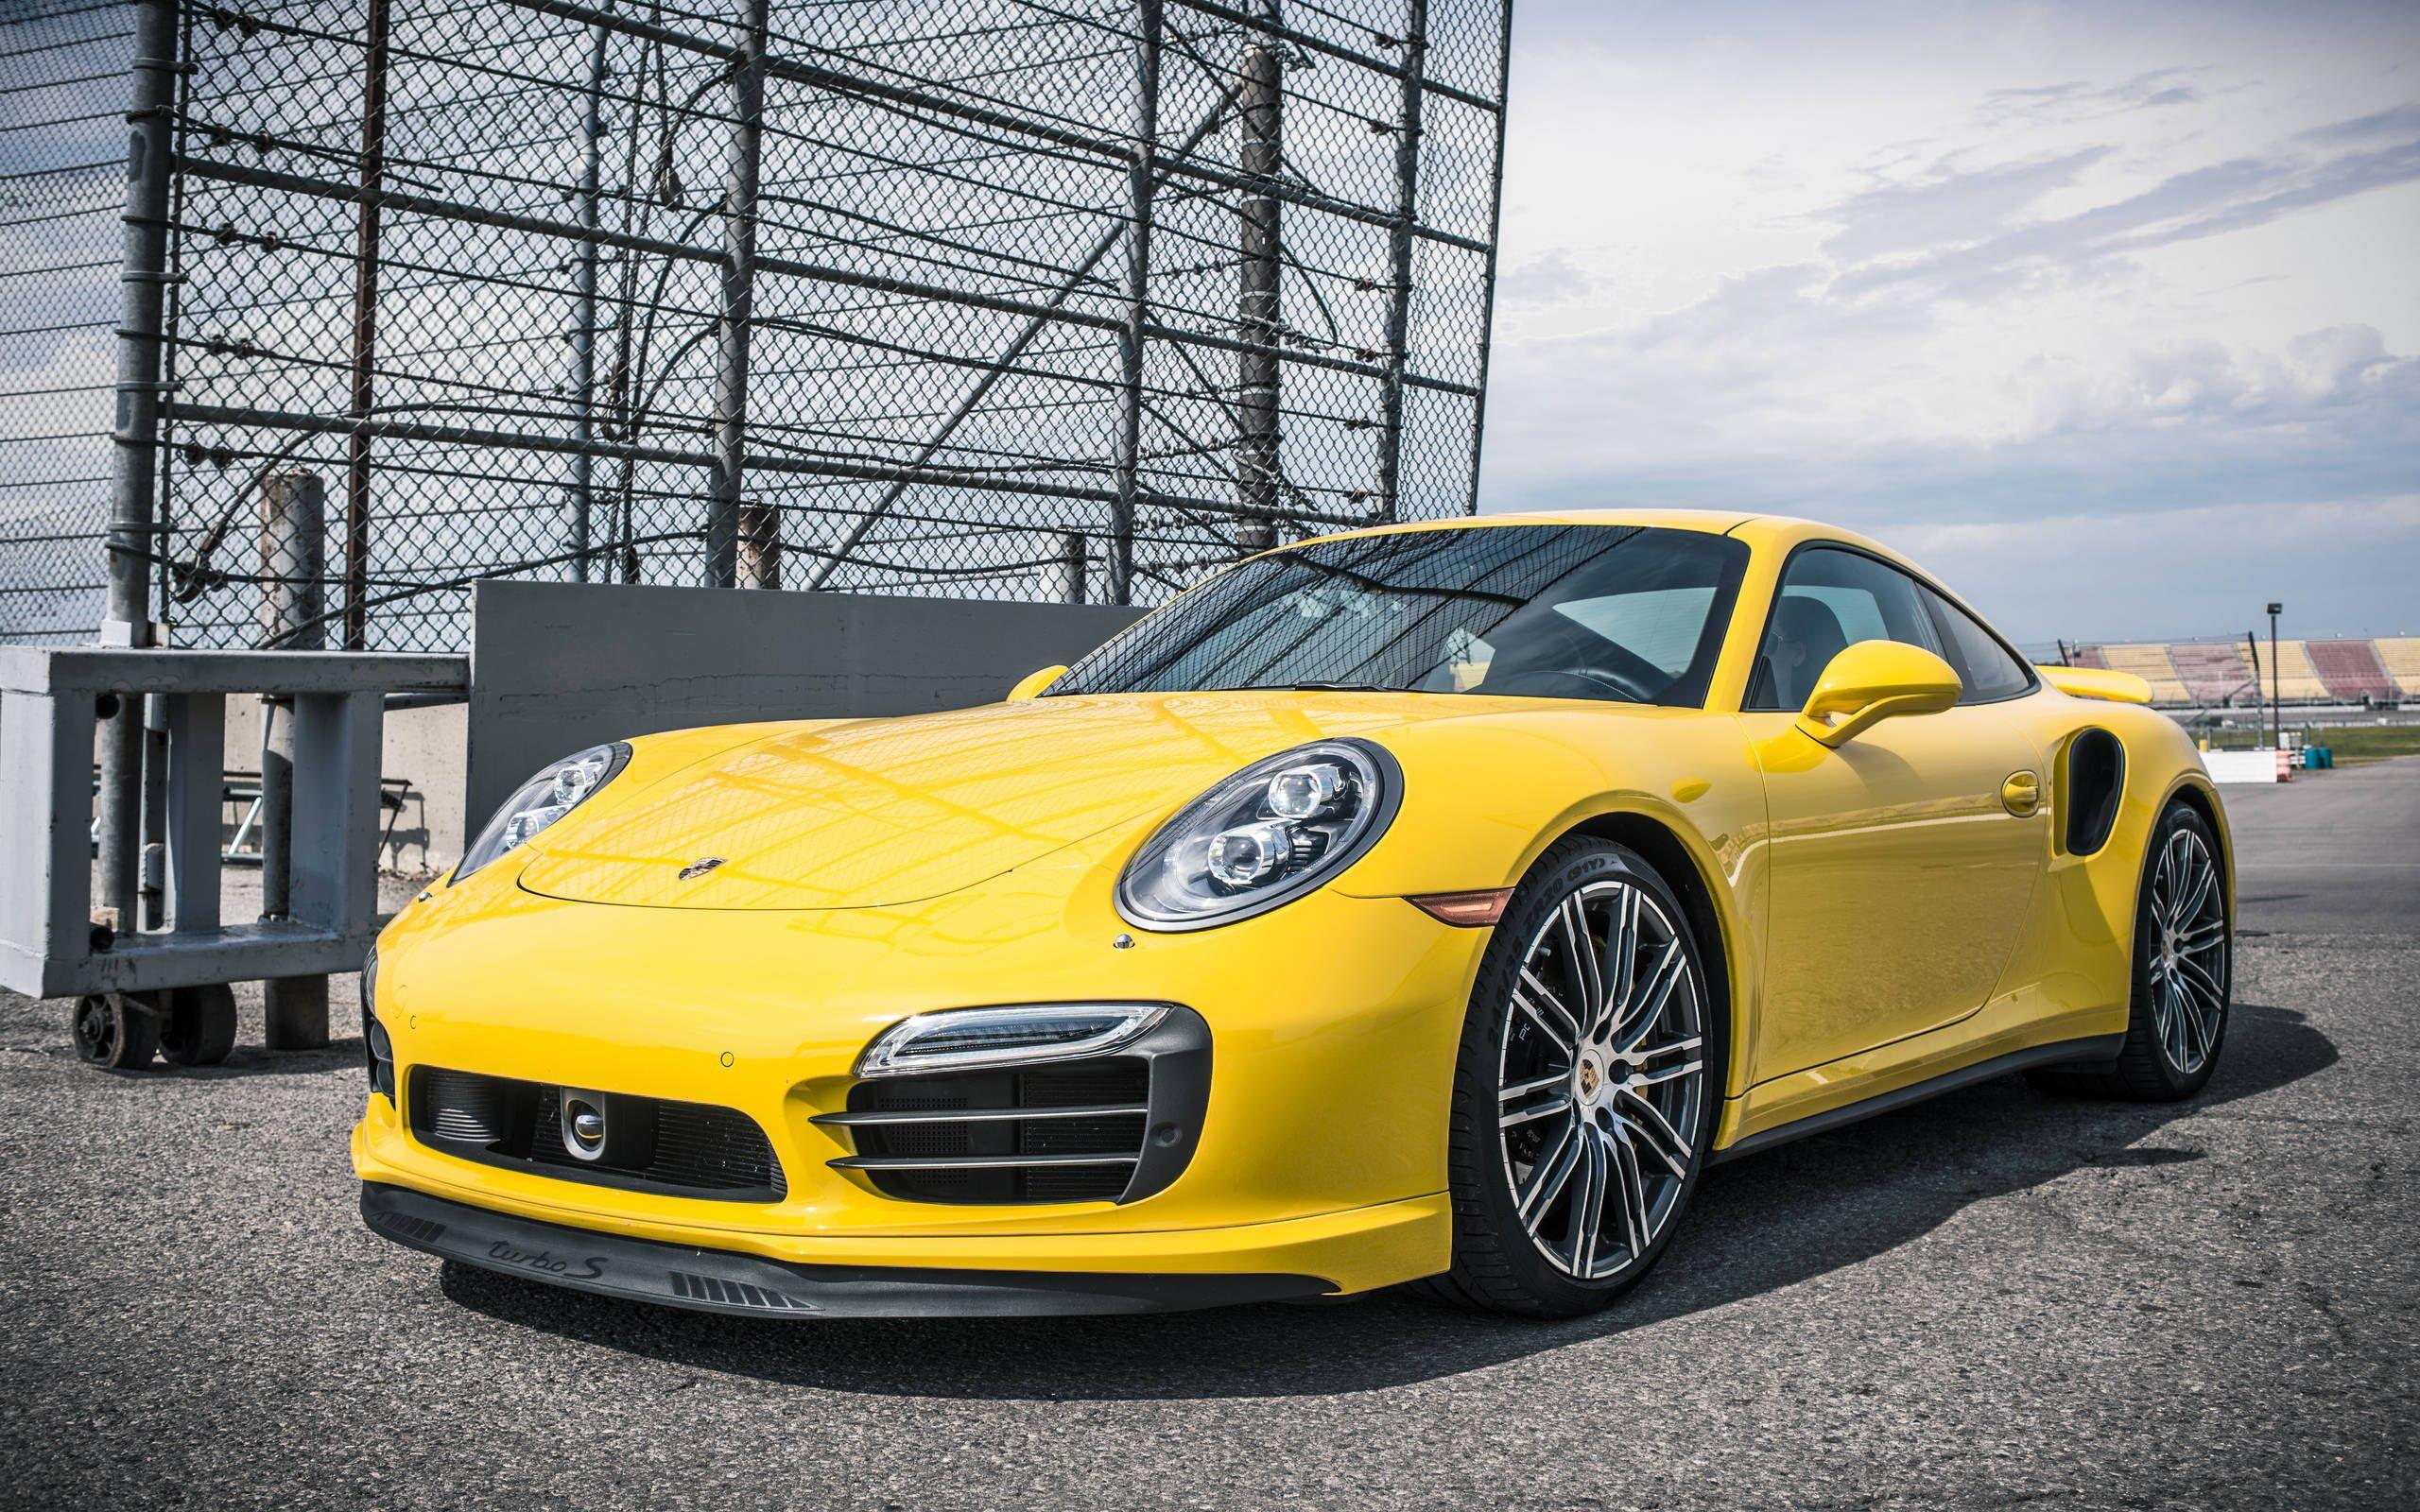 2014 Porsche 911 Carrera Turbo S Review Notes